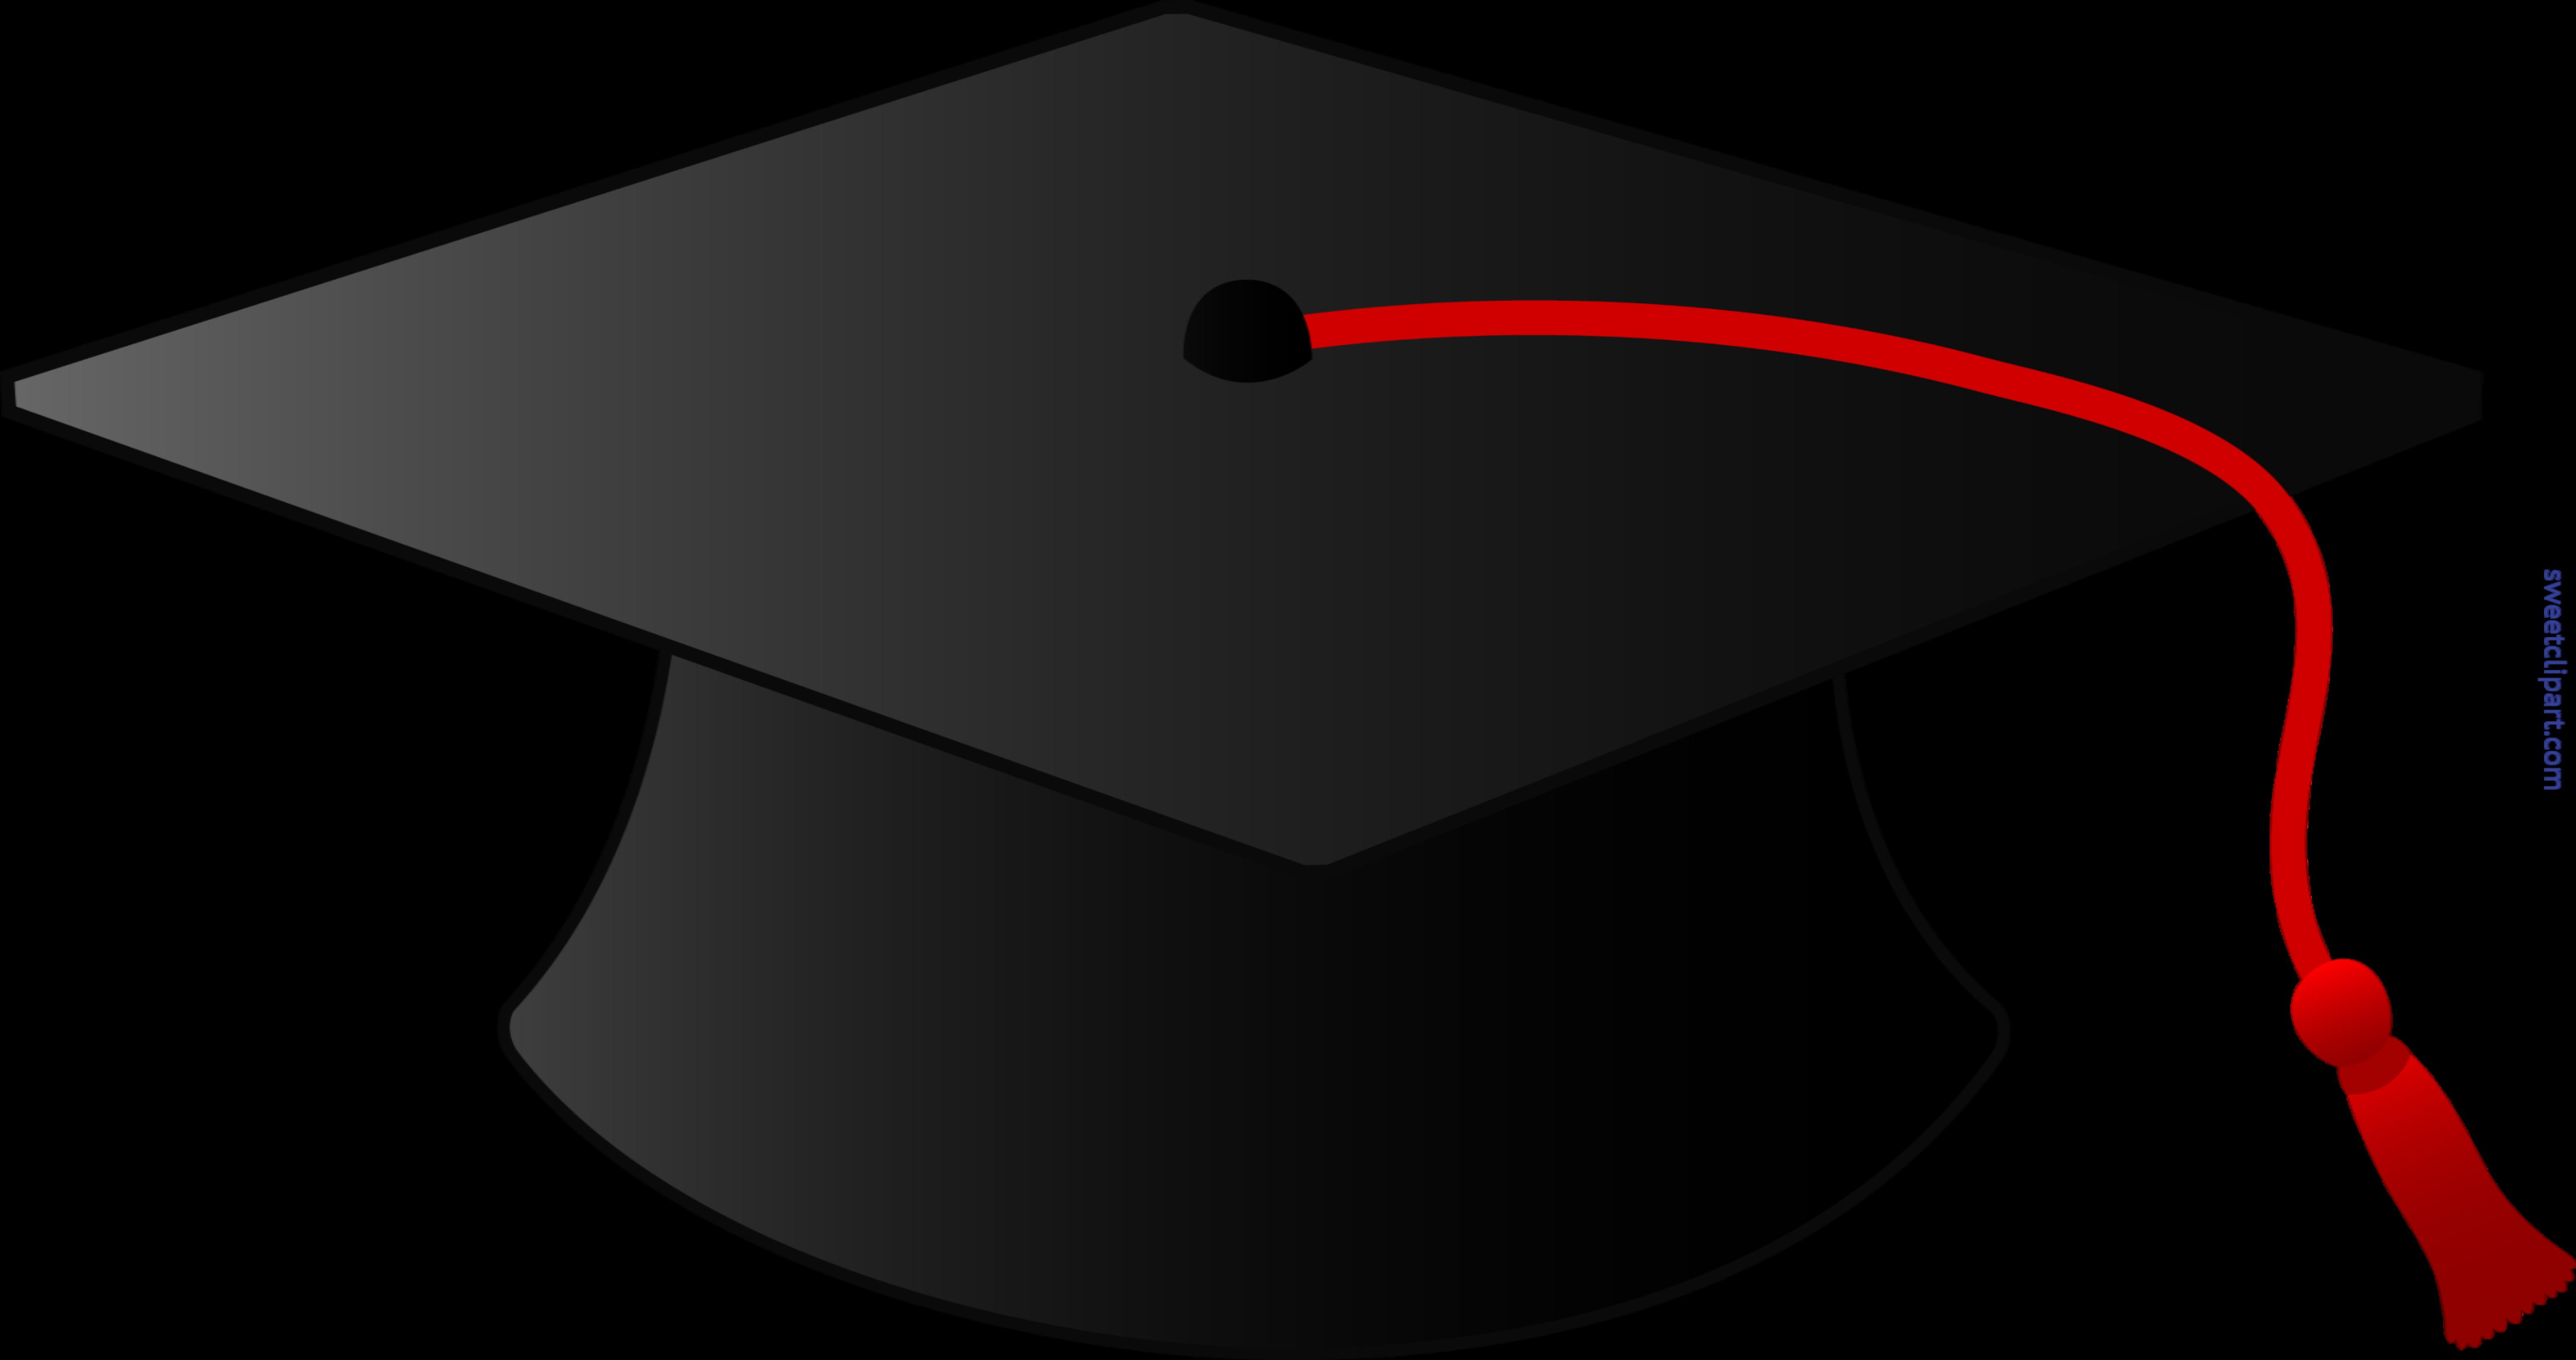 vector royalty free download Graduation with tassel clip. 2018 clipart grad cap